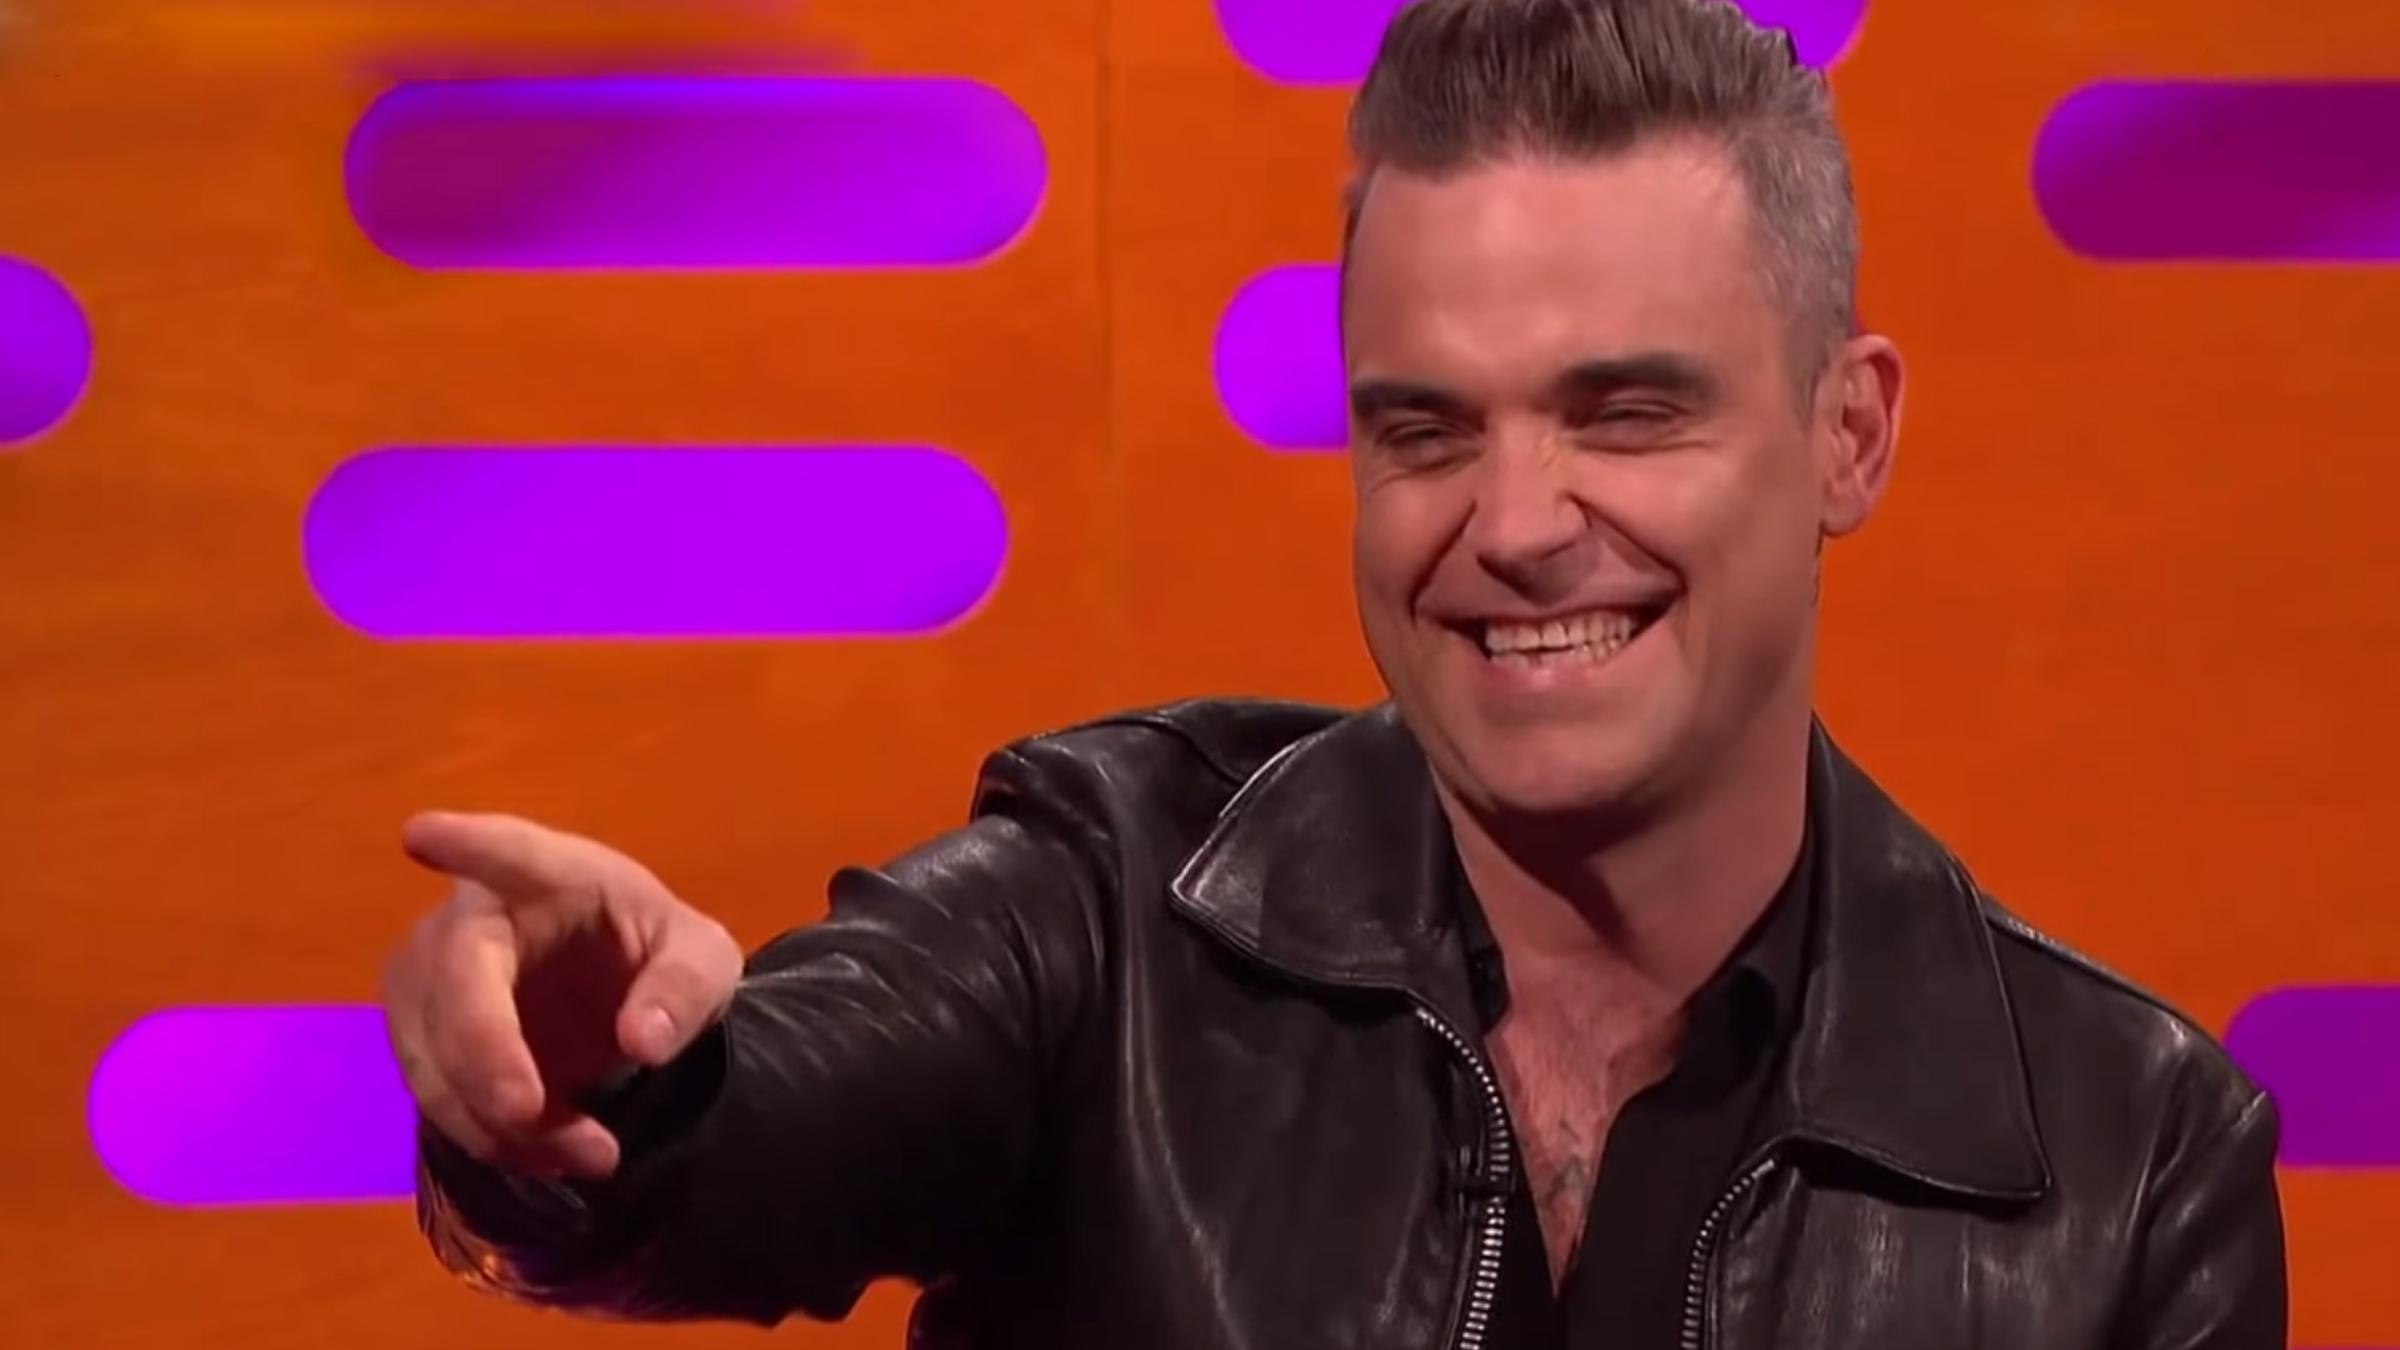 Robbie graham teaser